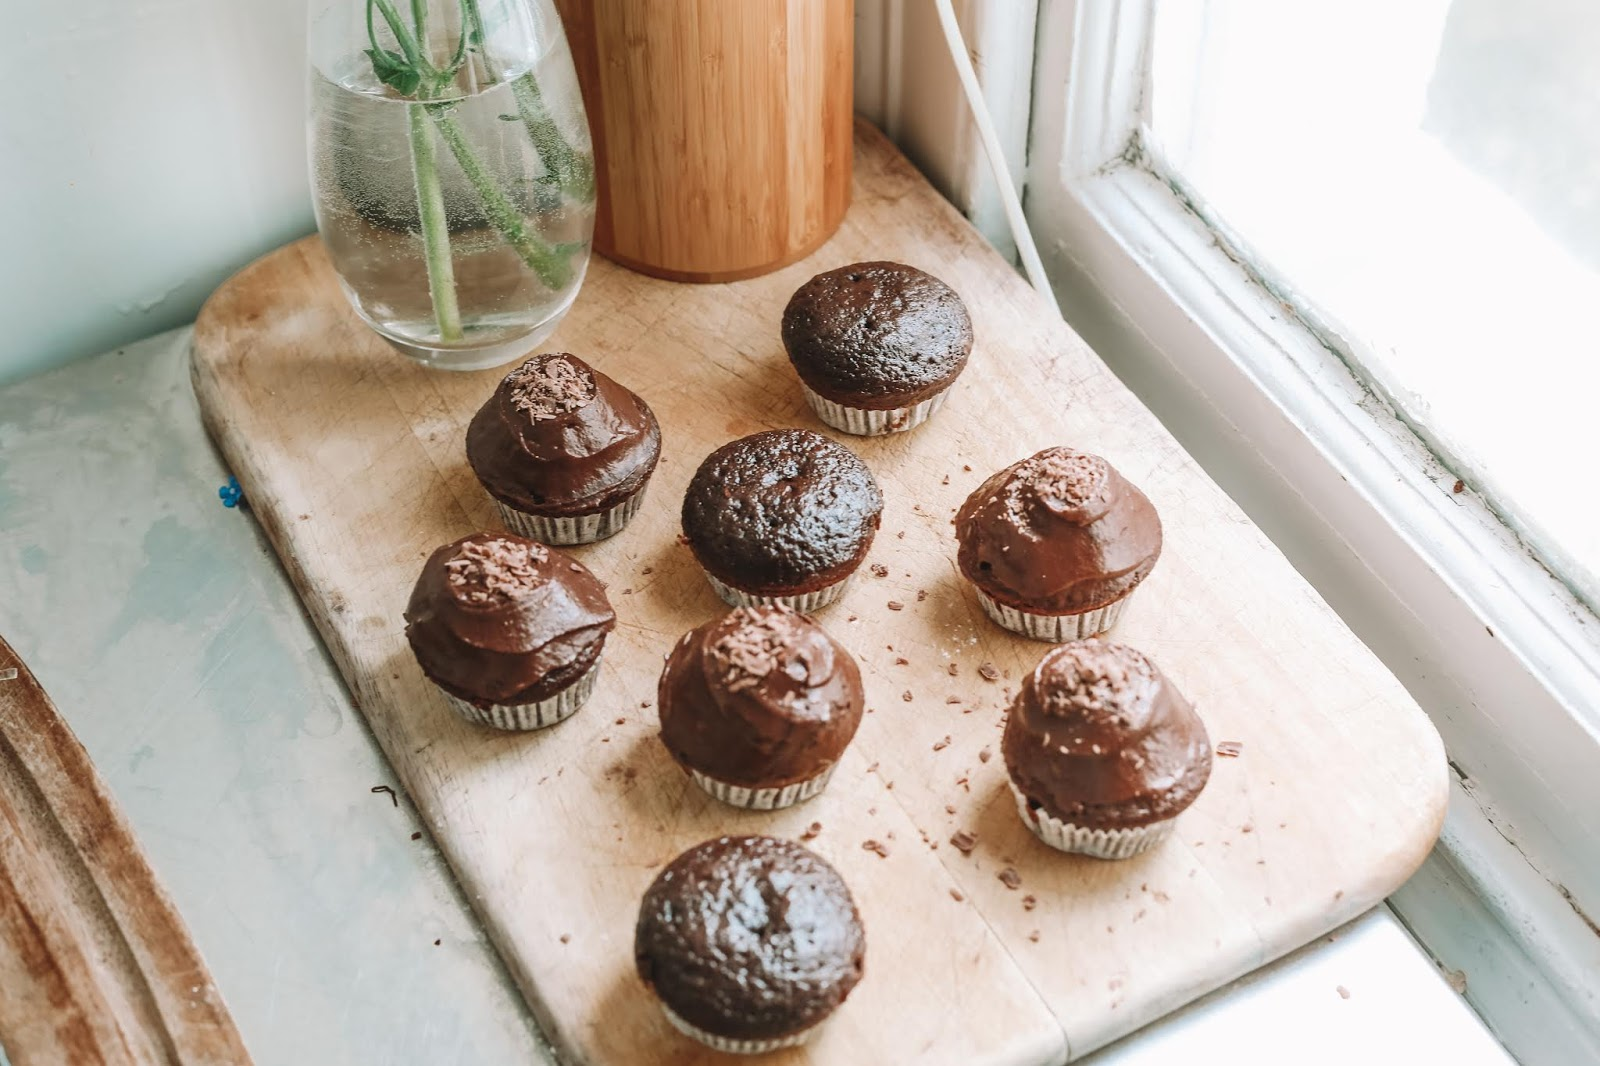 Rêveuse Recipe: The Best Chocolate Buttermilk Cupcakes